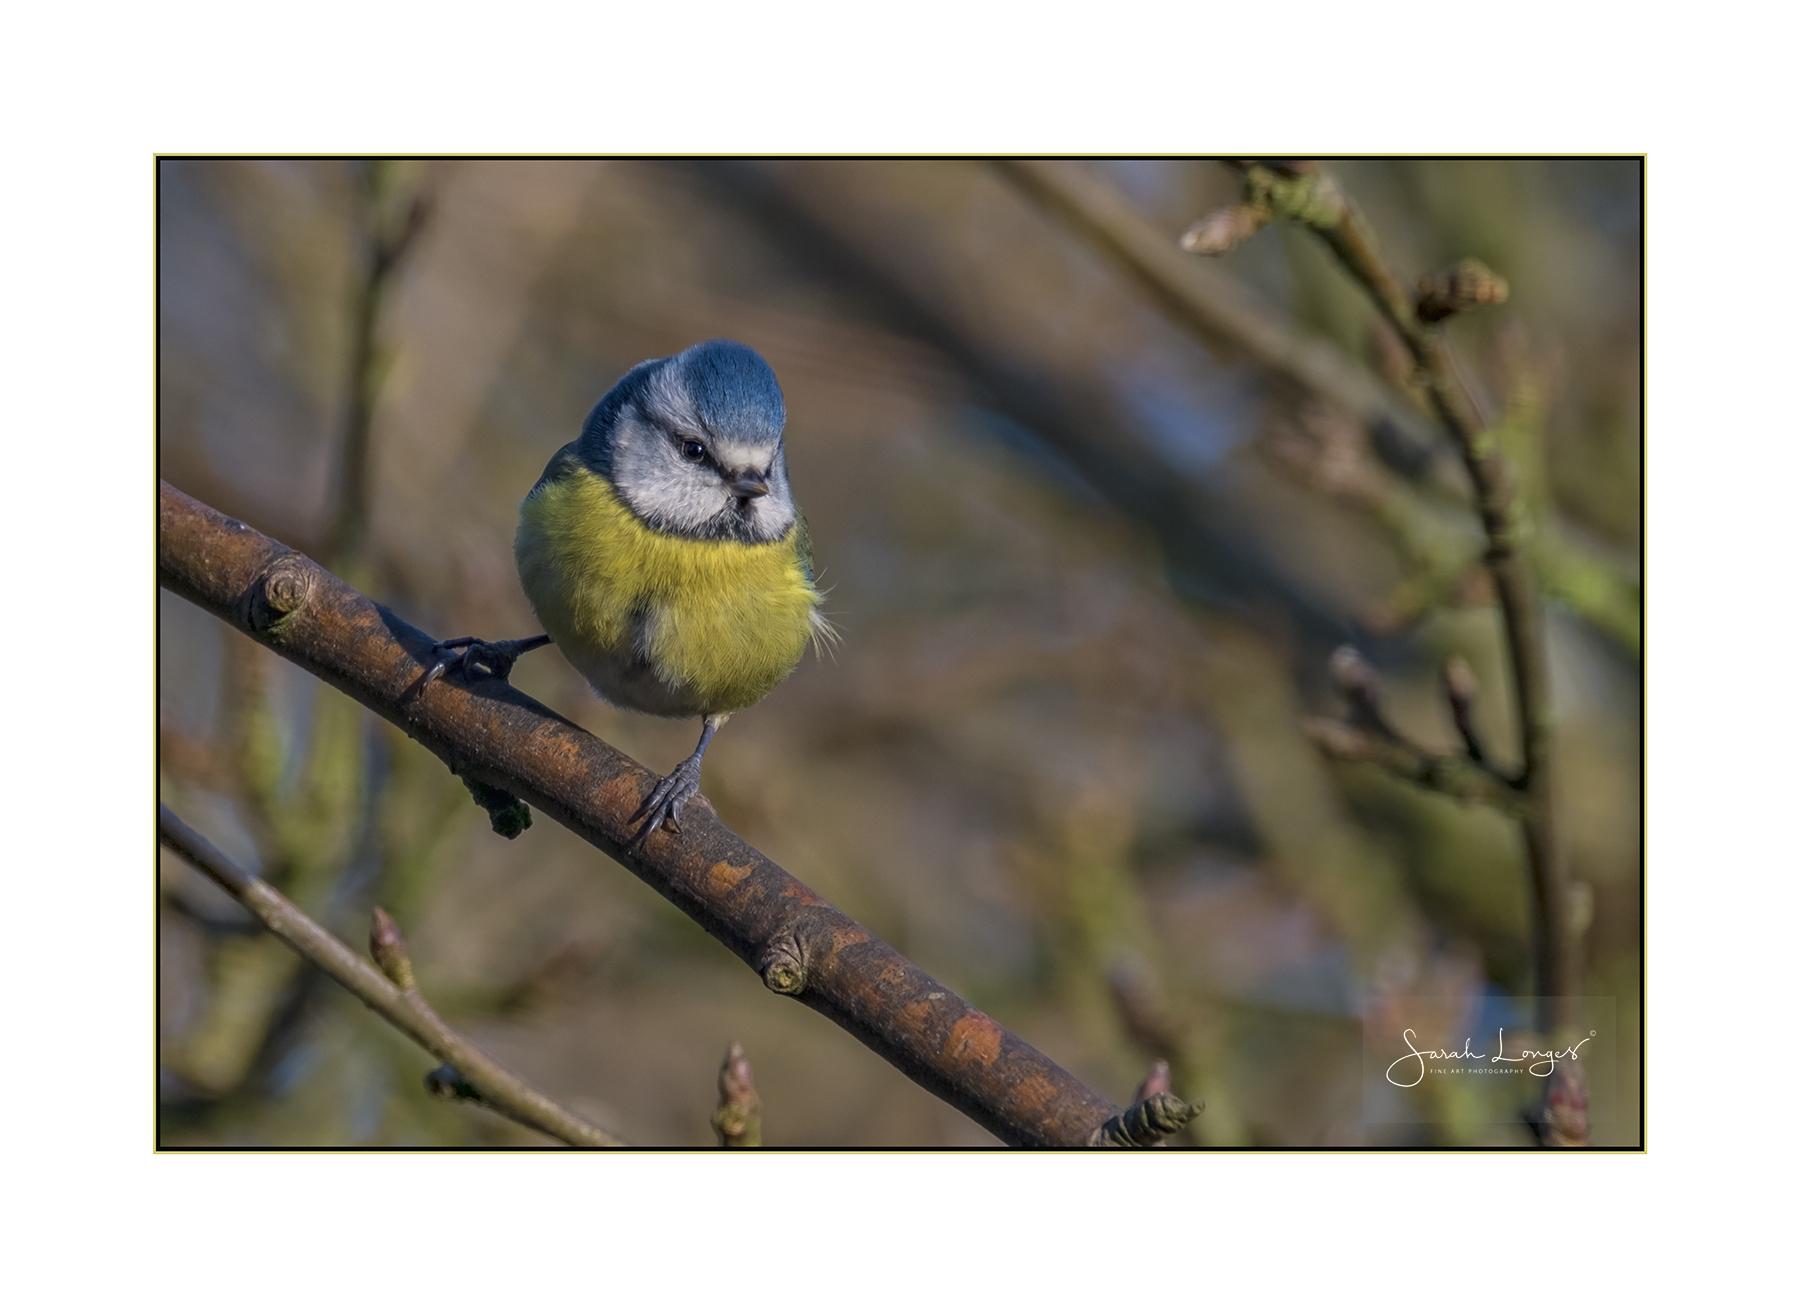 Blue Tit in Shropshire